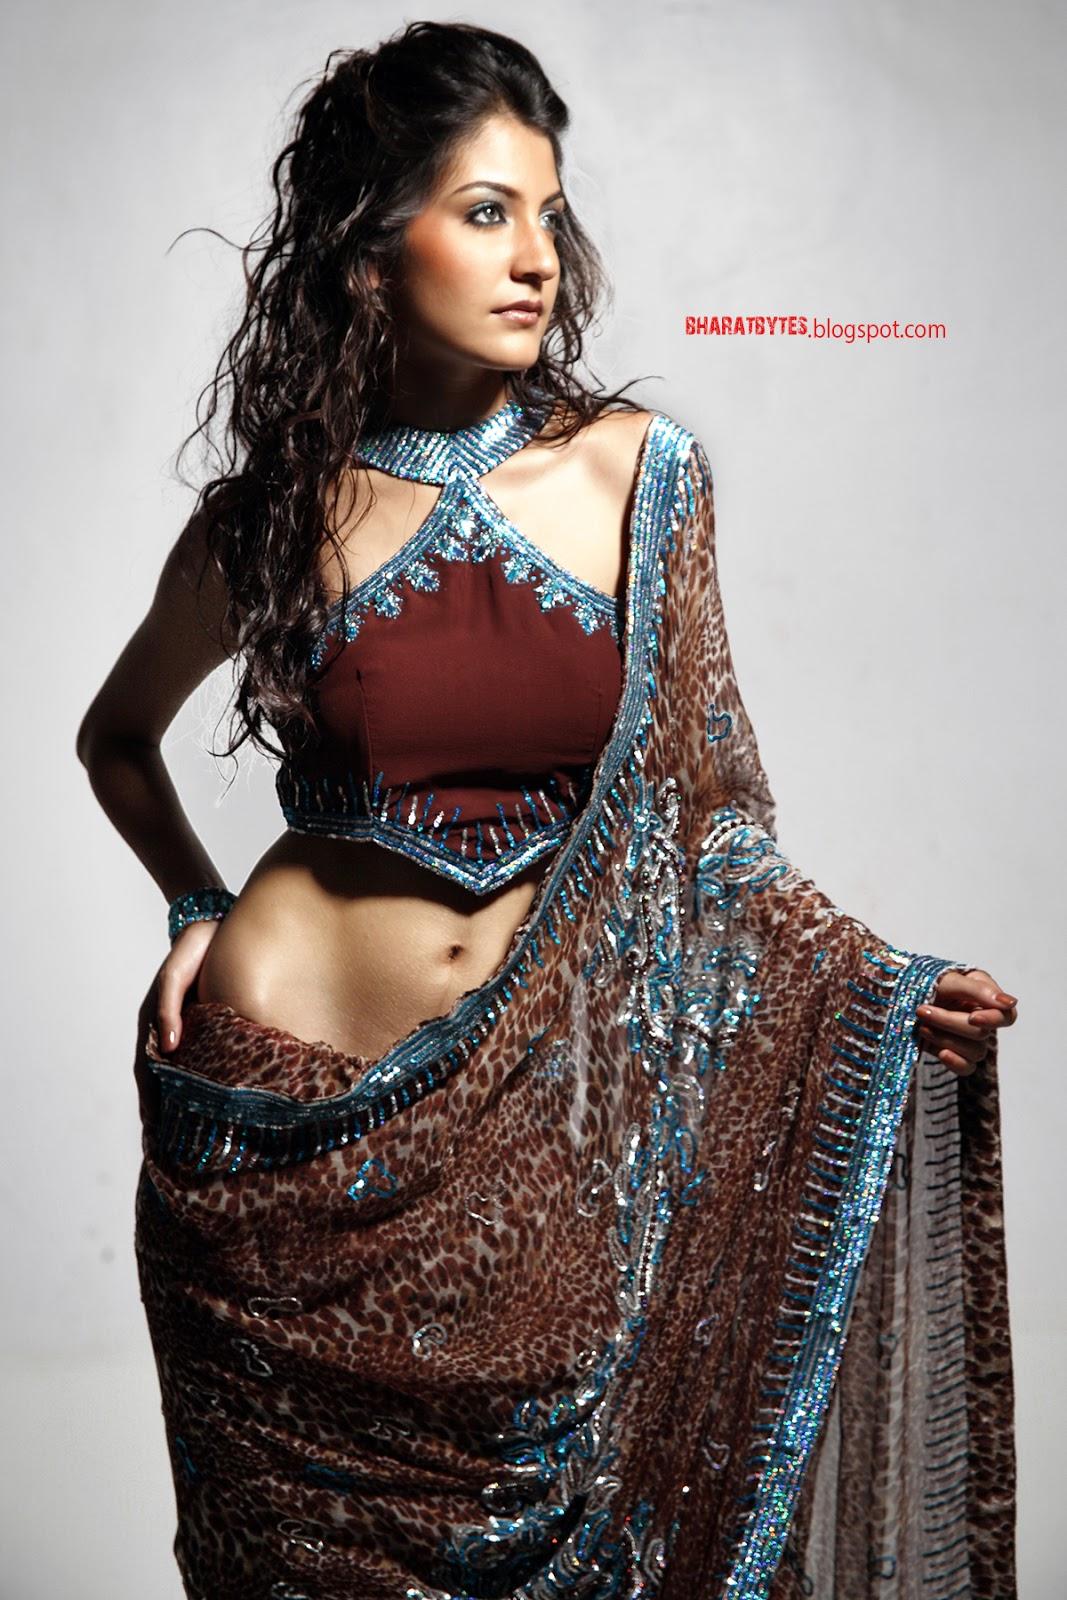 Sexy And Hot Pics Of Anushka Sharma